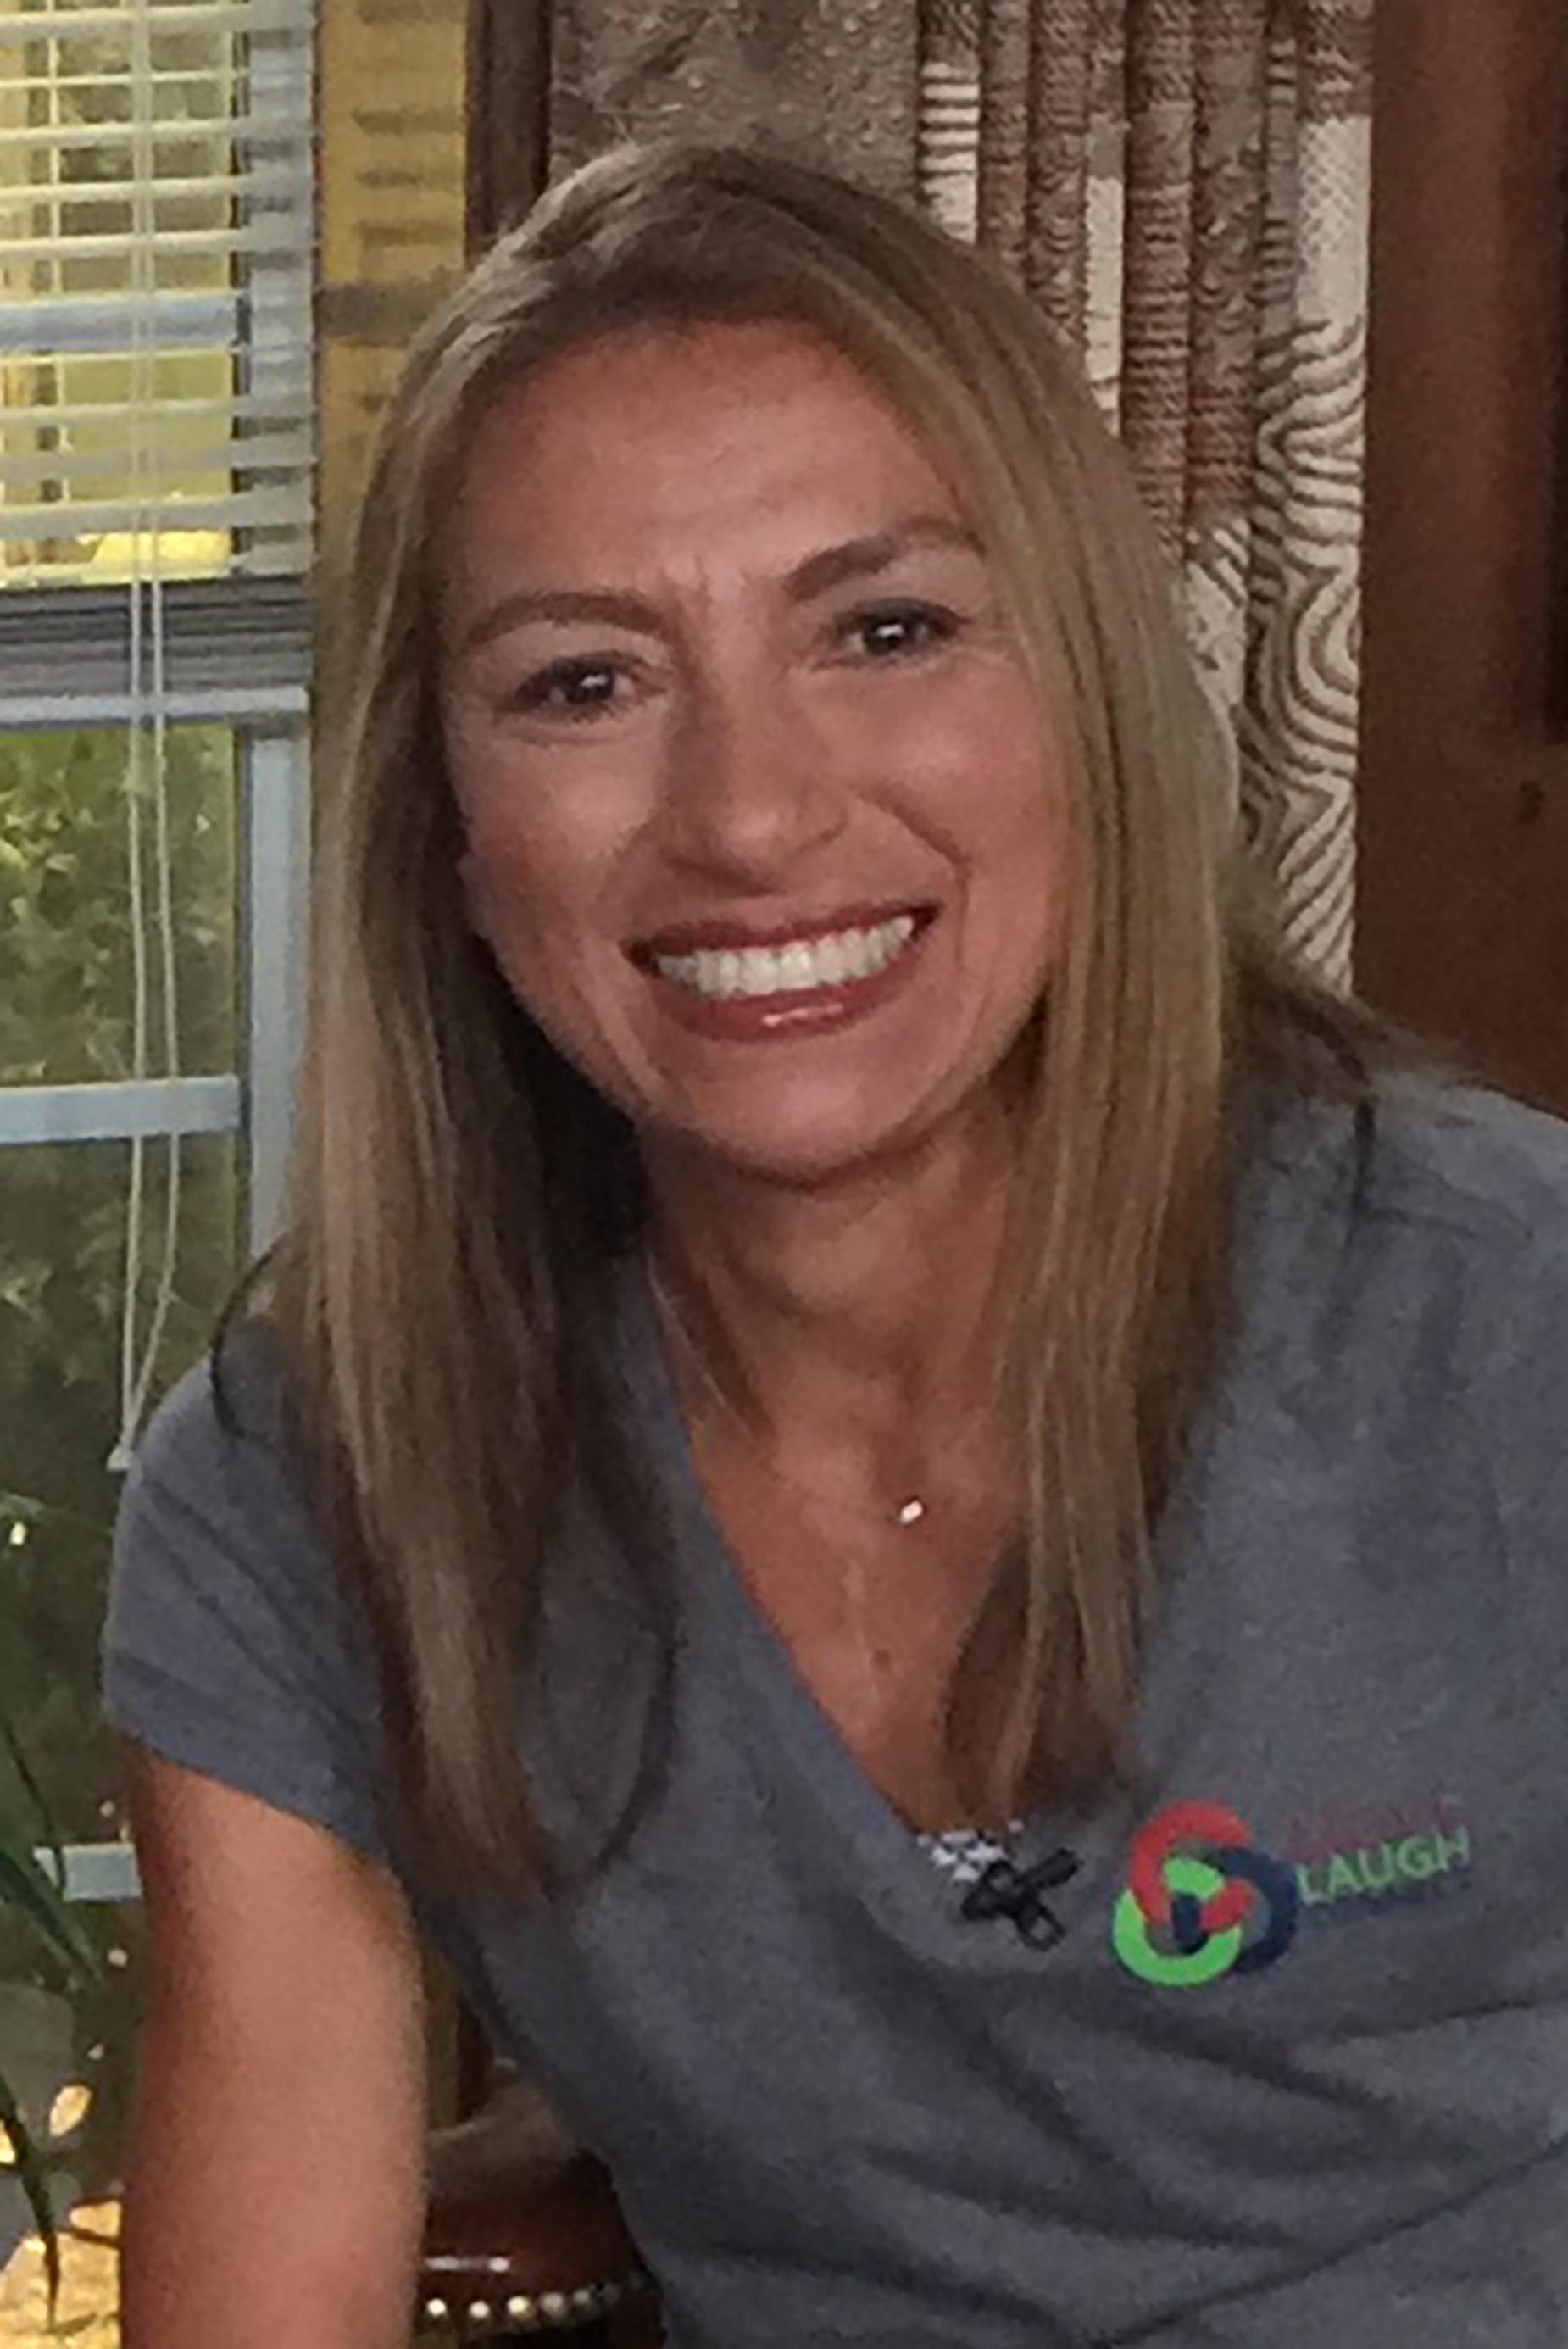 Carla_VideoHeadshot_MLC